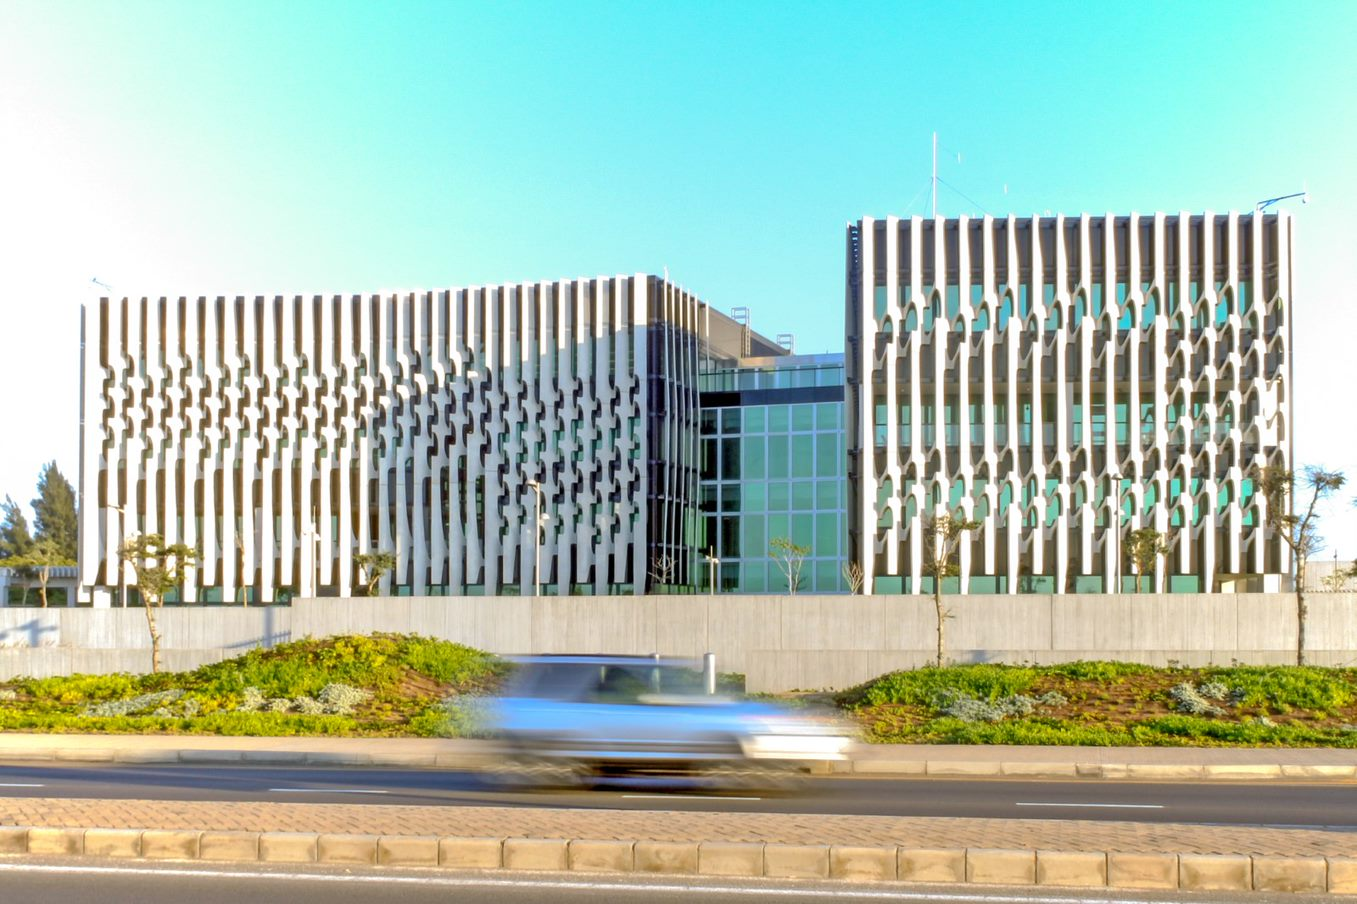 U.S. Embassy in Maputo